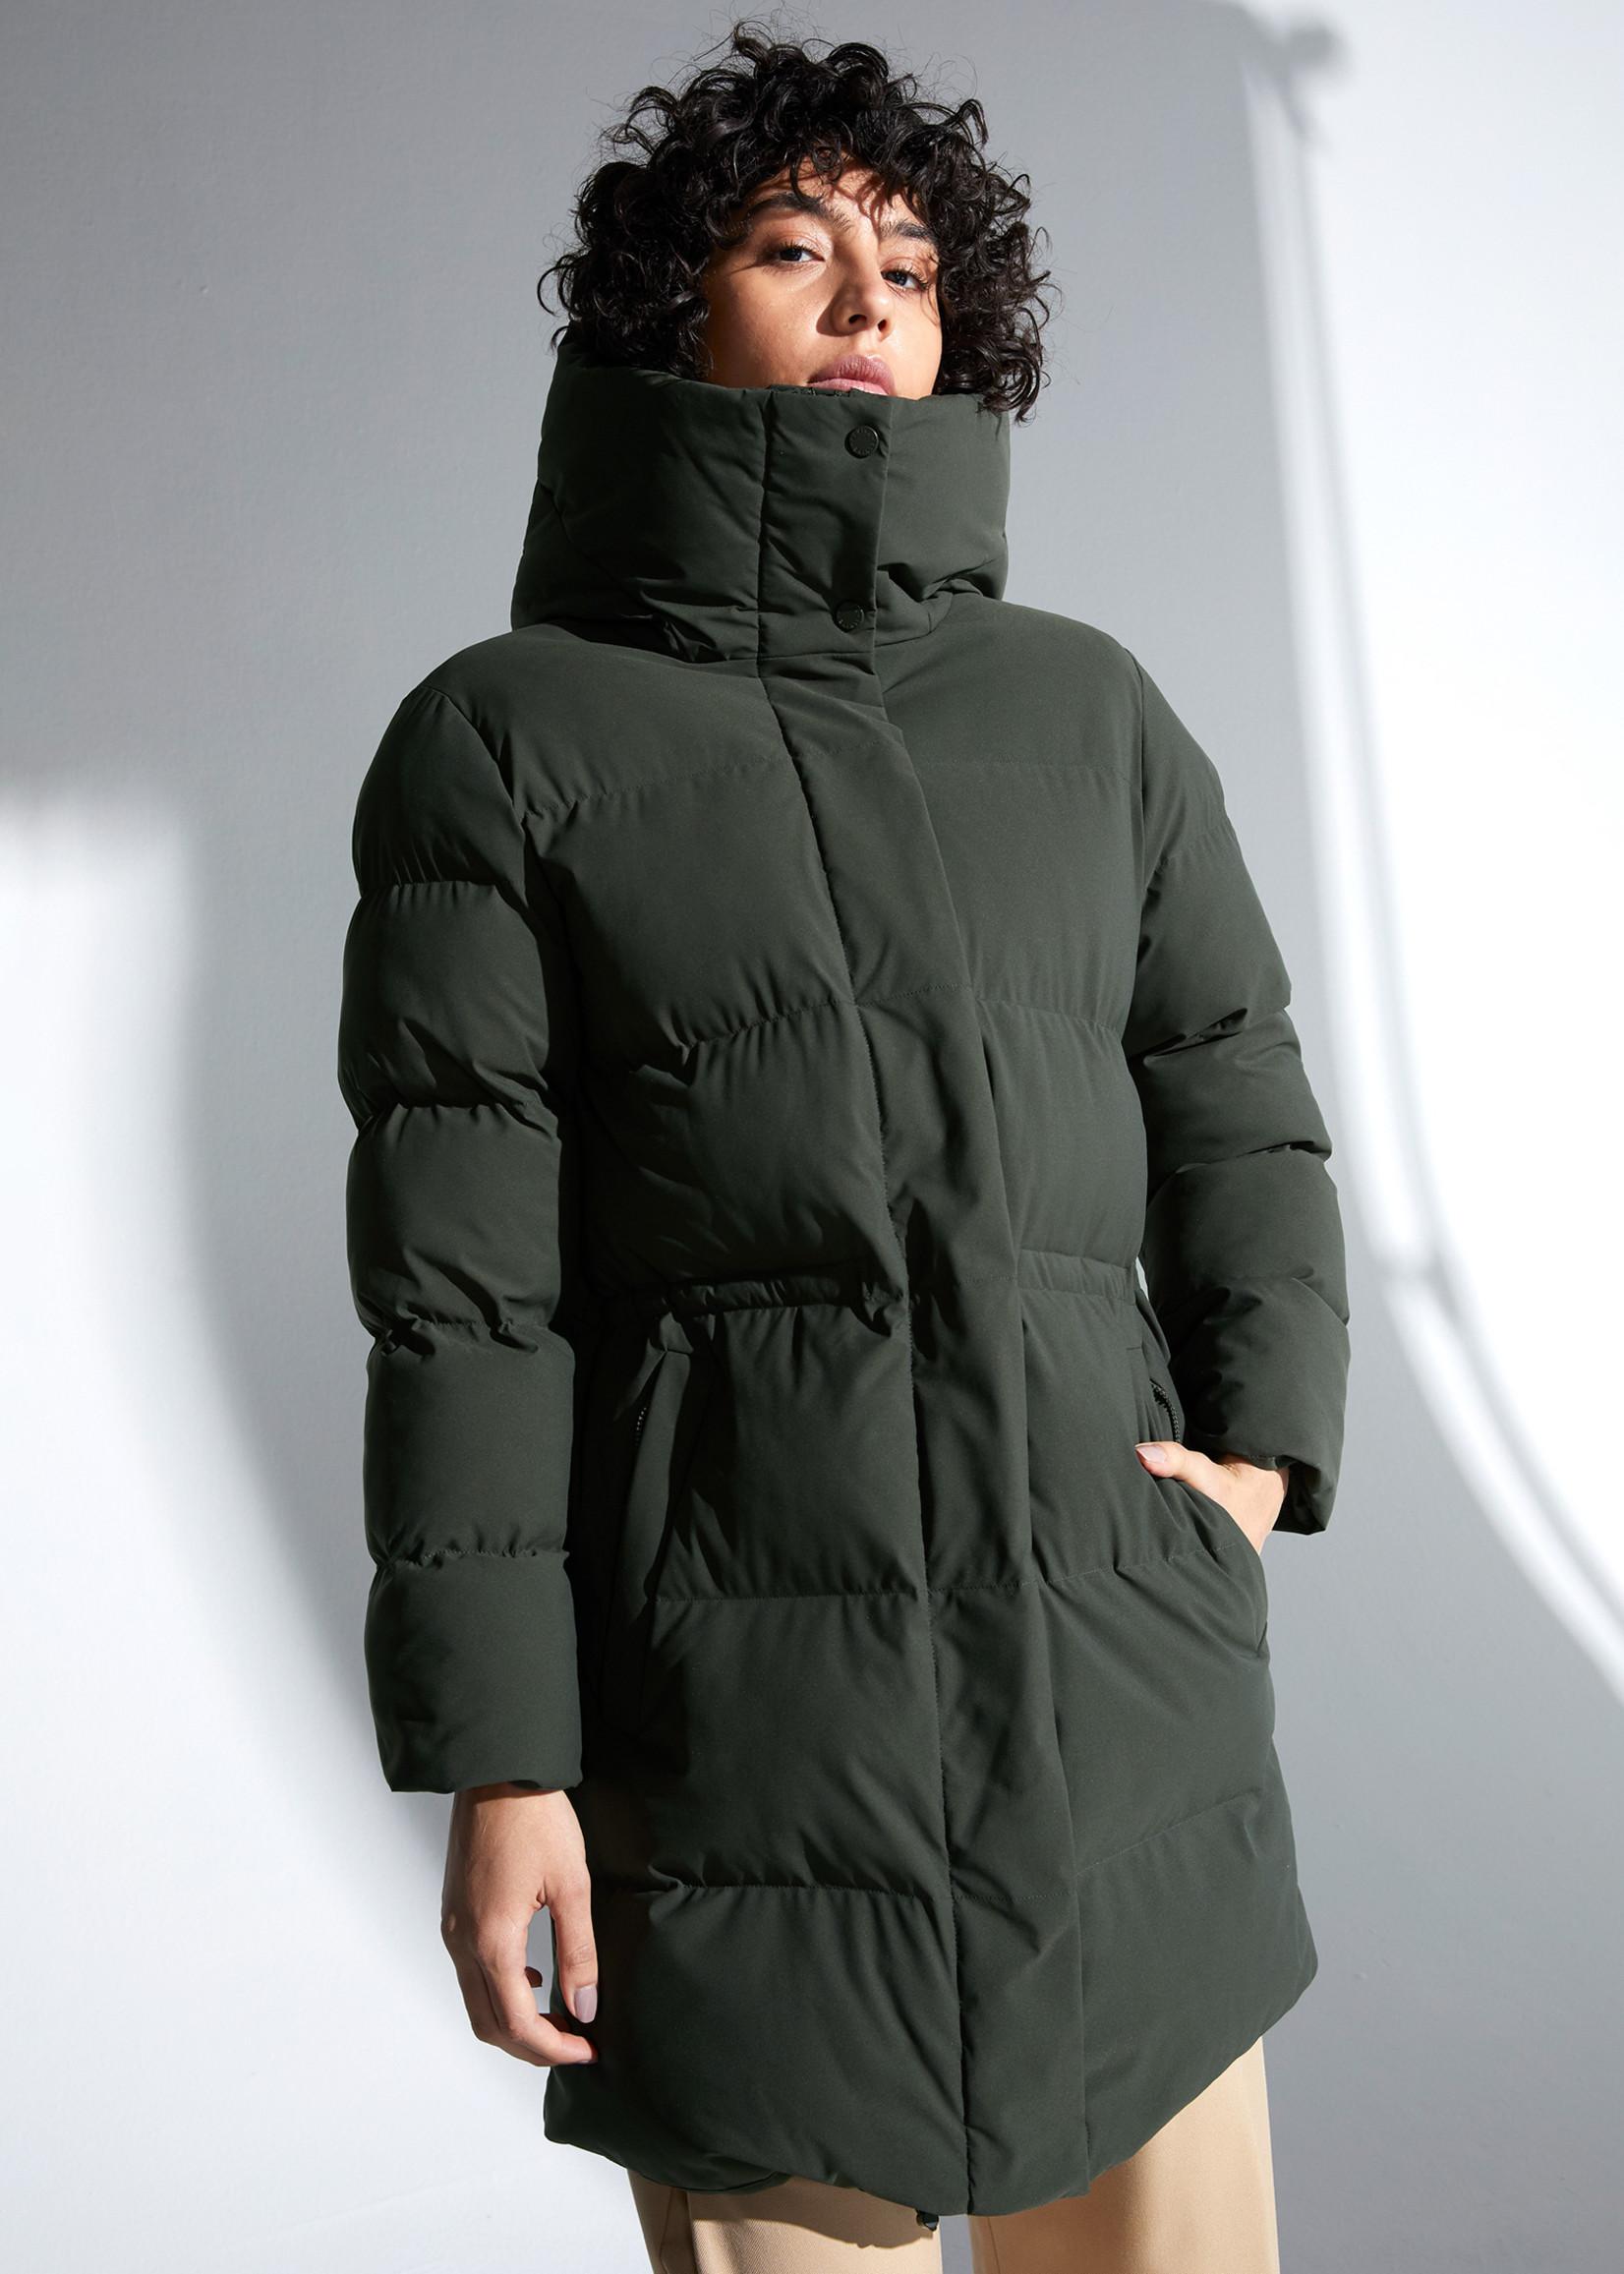 Elvine Vesper Jacket